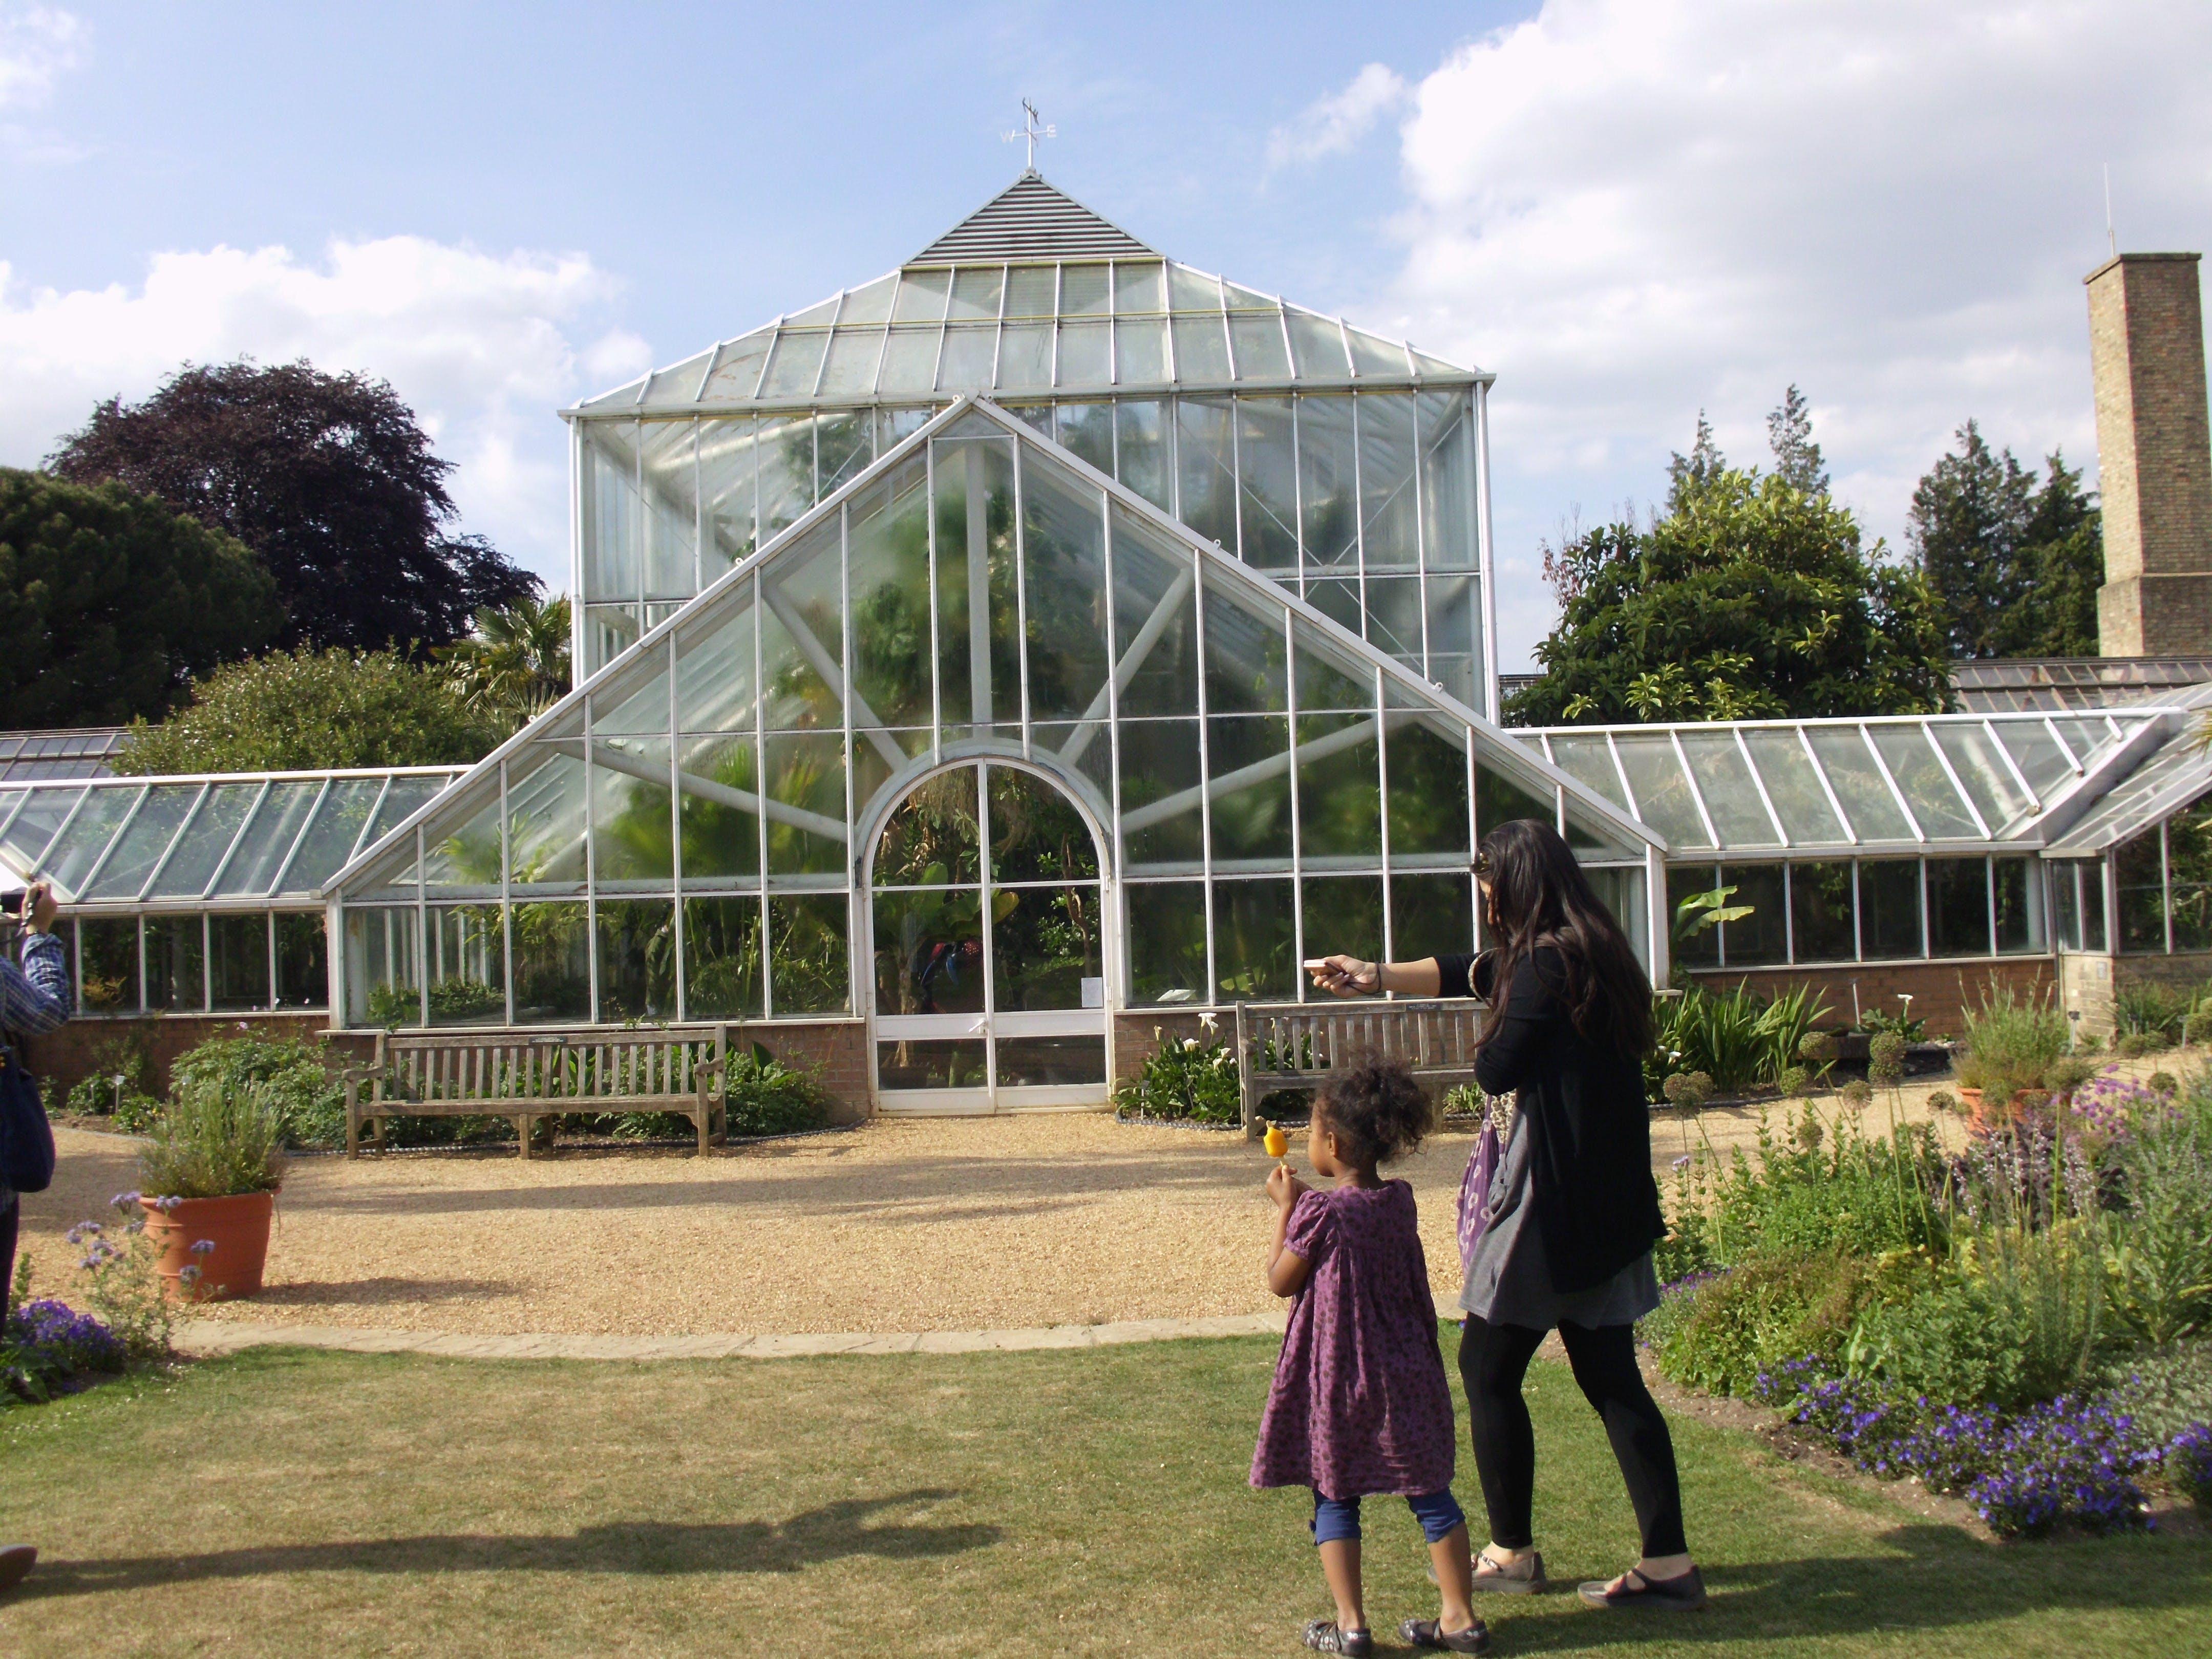 Free stock photo of Green House at Cambridge University Botanic Garden